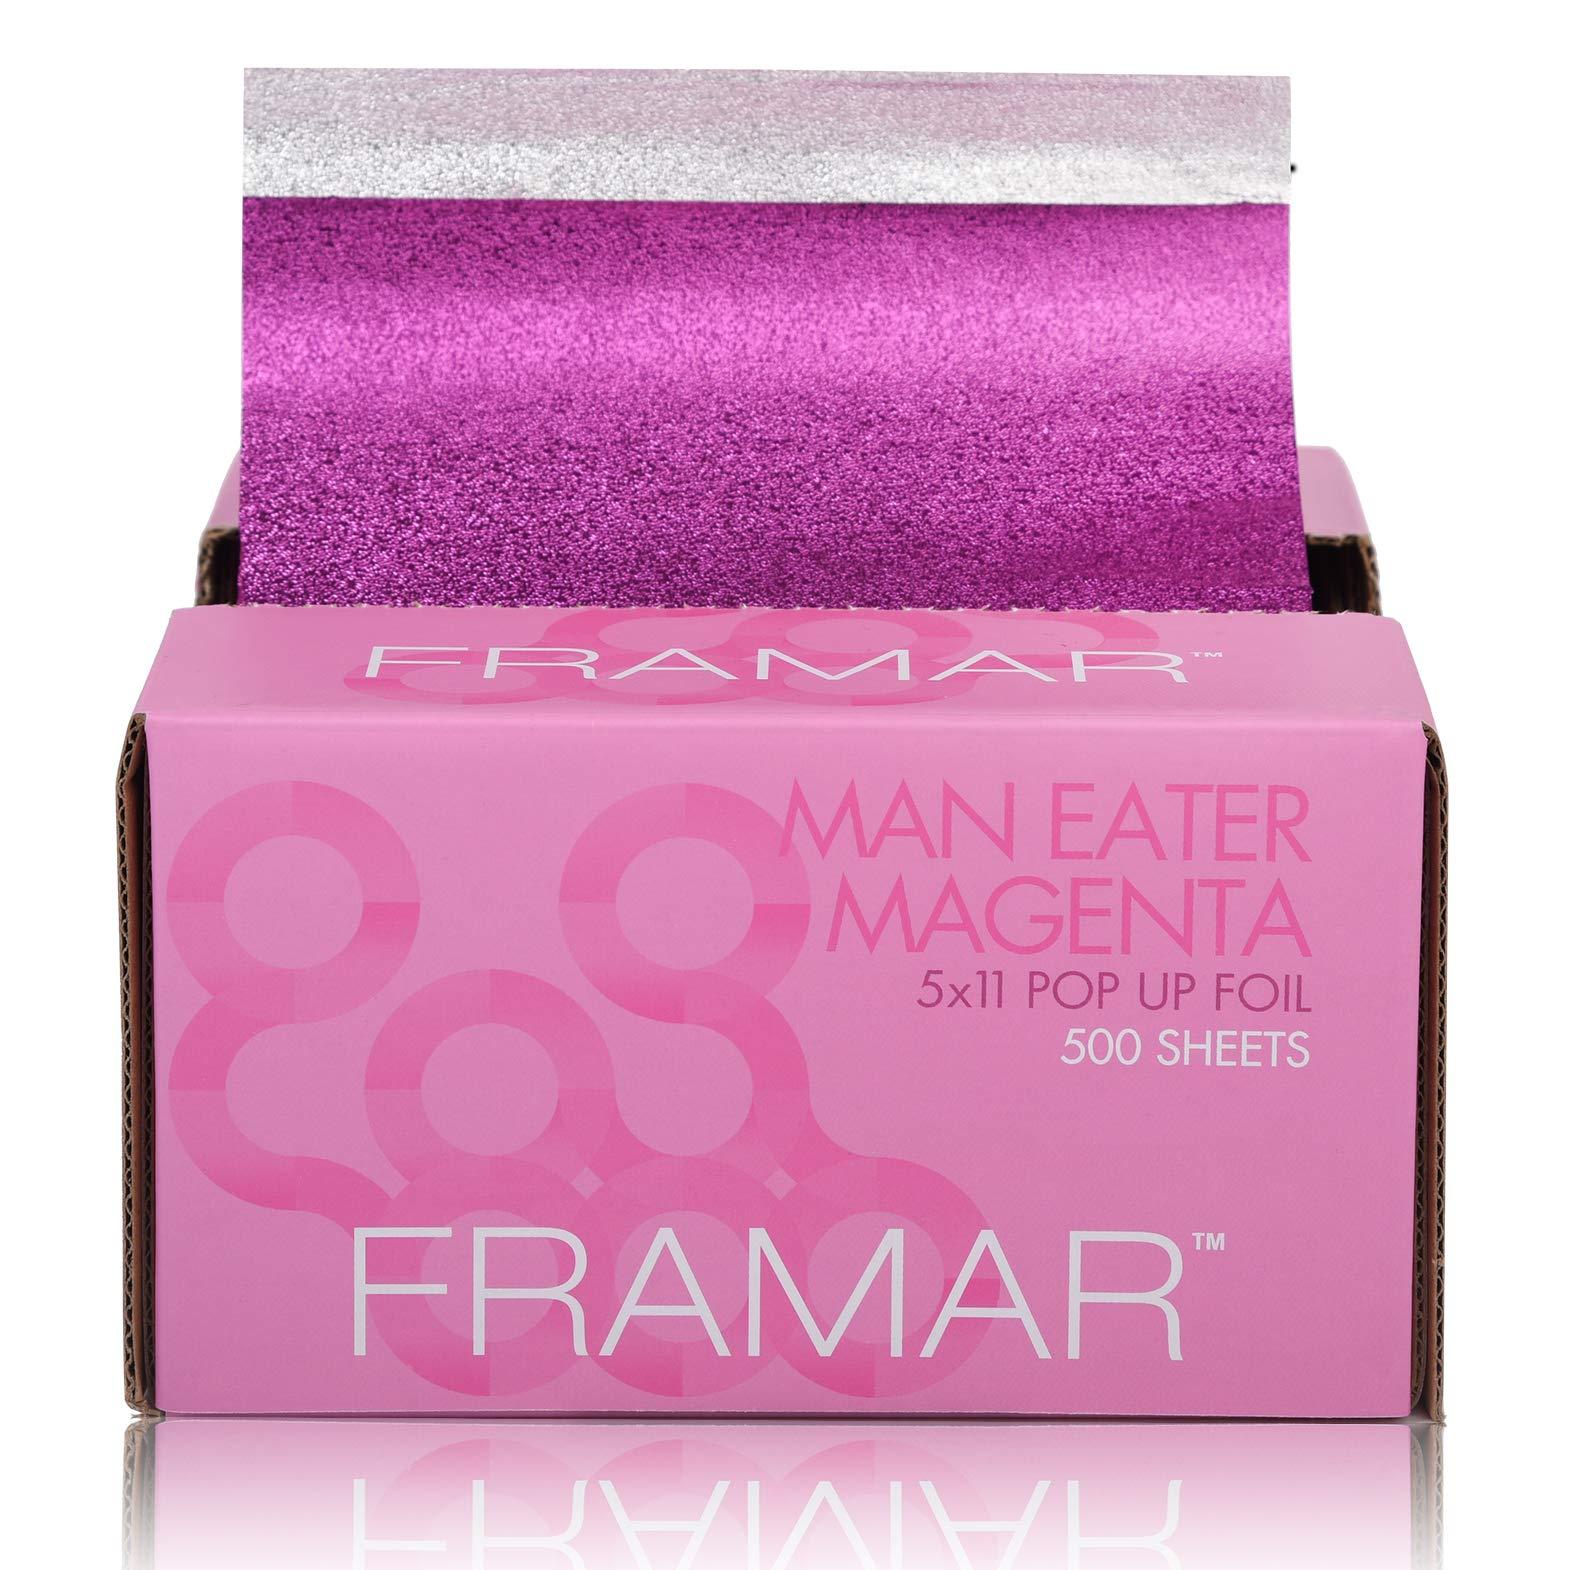 Framar Magenta Pop Up Hair Foil, Aluminum Foil Sheets, Hair Foils For Highlighting - 500 Foil Sheets by FRAMAR